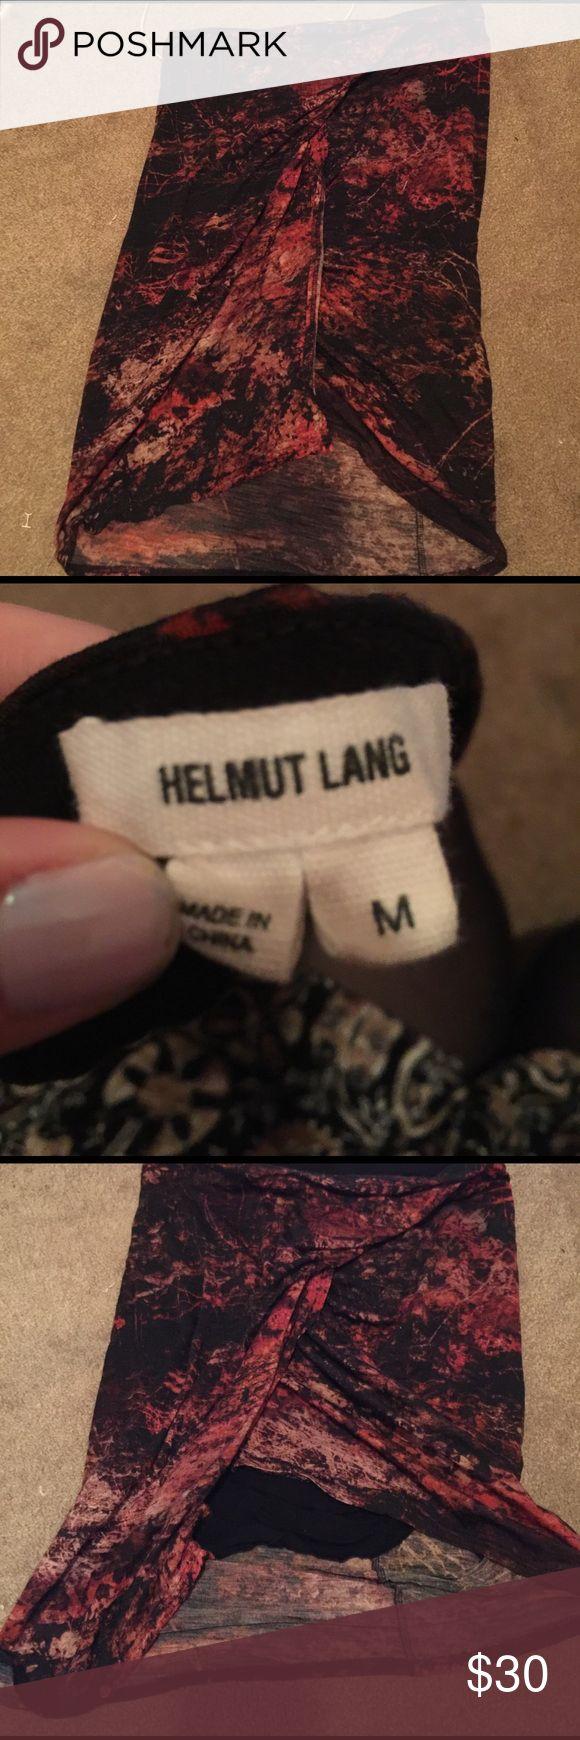 Helmut Lang Tulip 🌷 Pencil Skirt Fire 🔥 Mini Helmut Lang skirt. Size medium. Tulip skirt. So beautiful! Helmut Lang Skirts Pencil